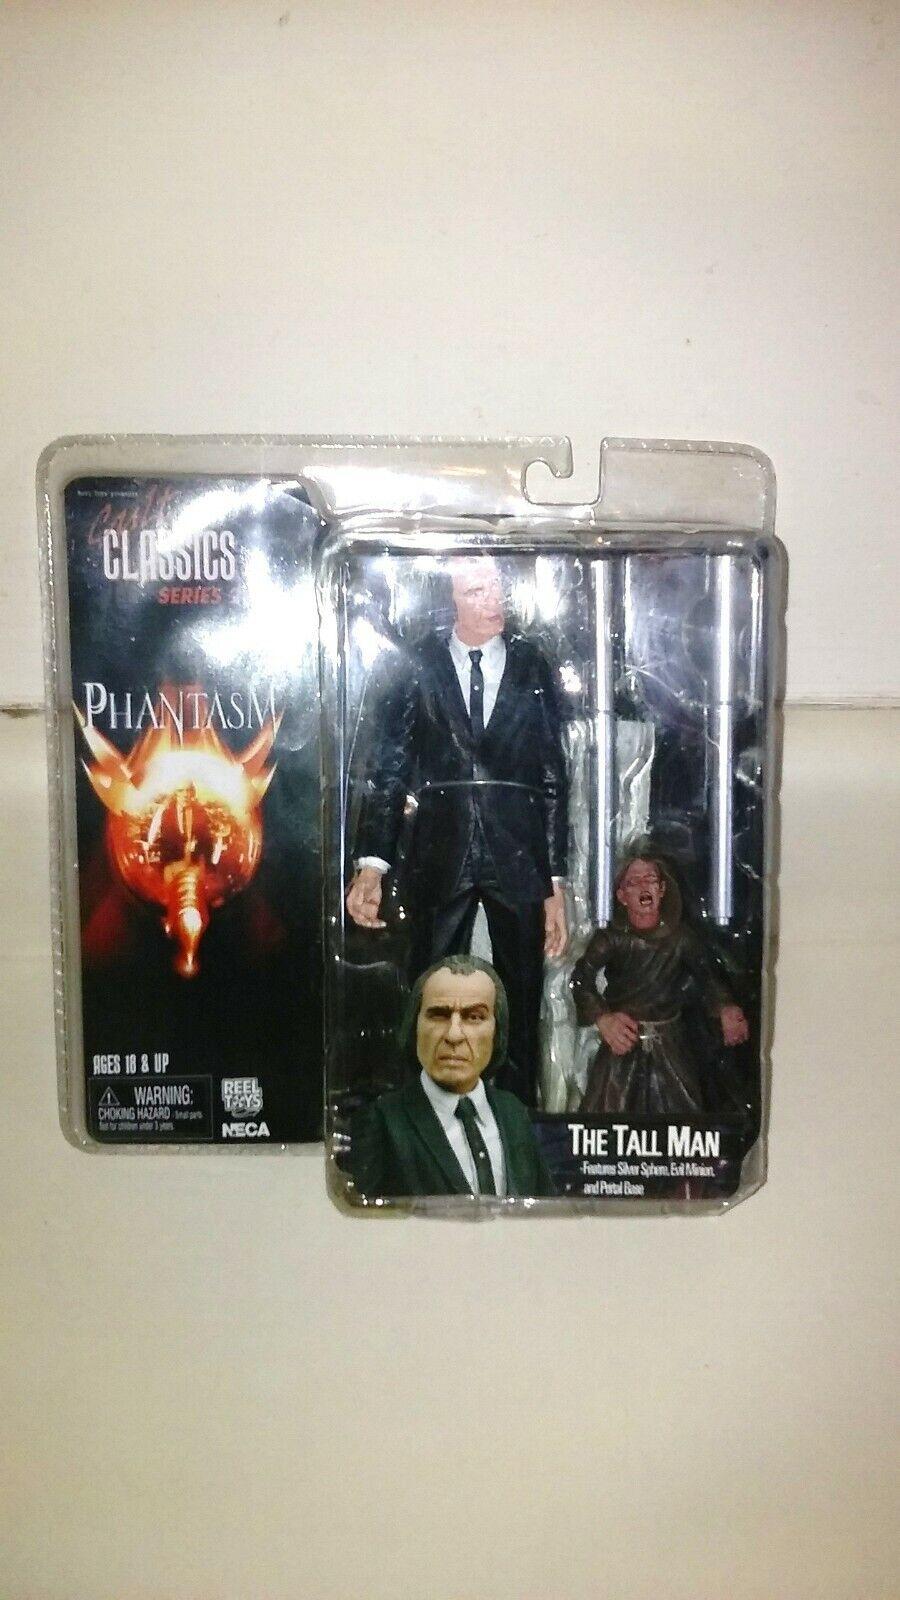 The Tall Man Cult Classics Serie 2 Phantasm Neca actionfiguren.Helt ny.